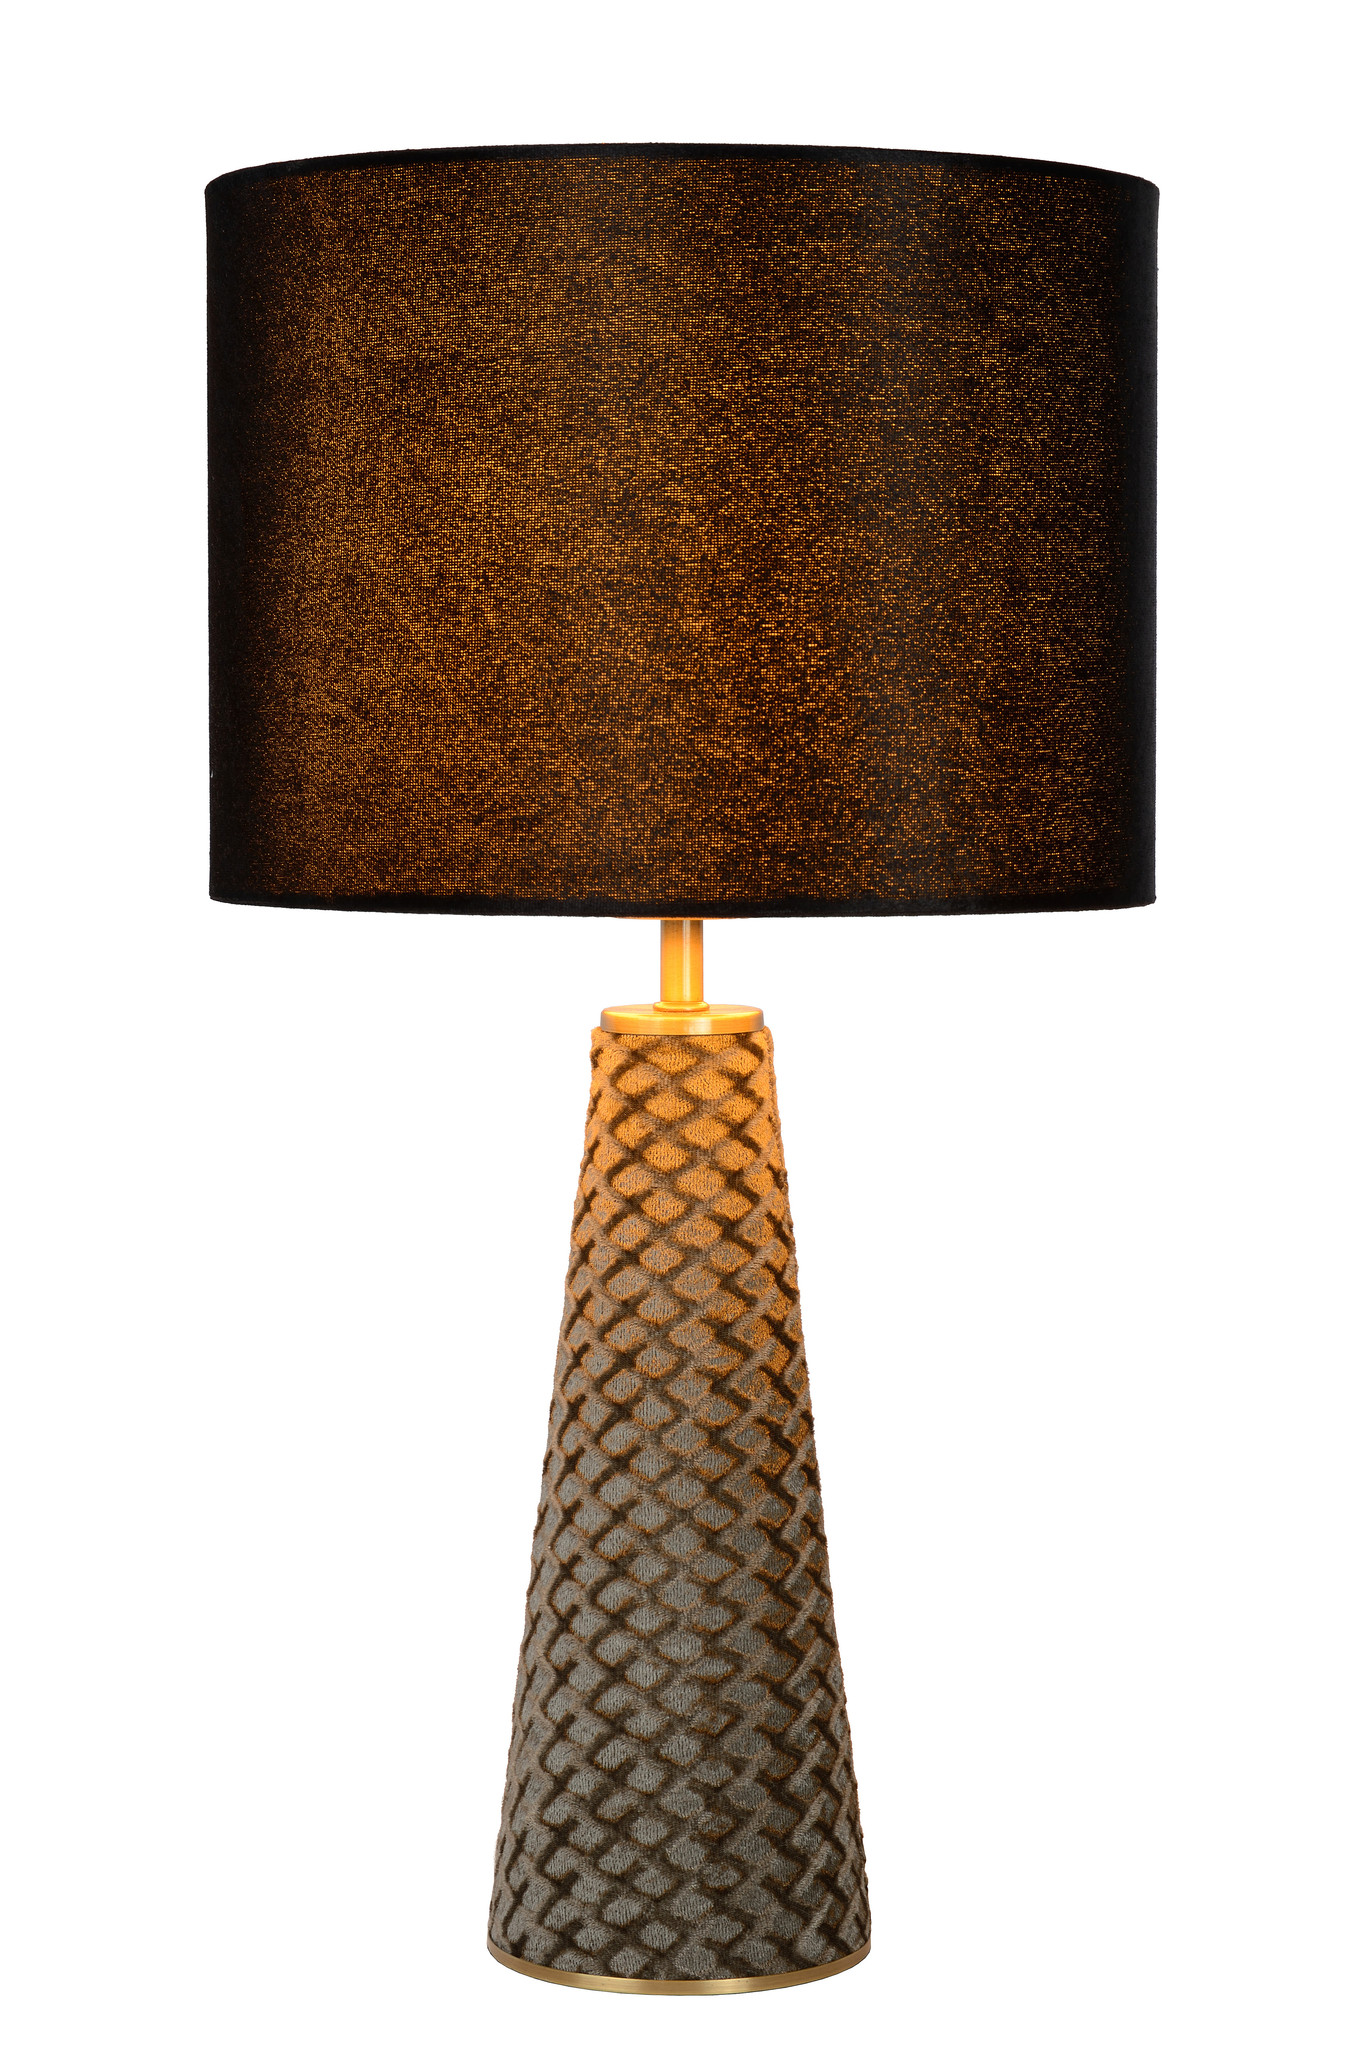 Lucide VELVET. Tafellamp-Zwart-Ø25-1xE27-40W-Metaal